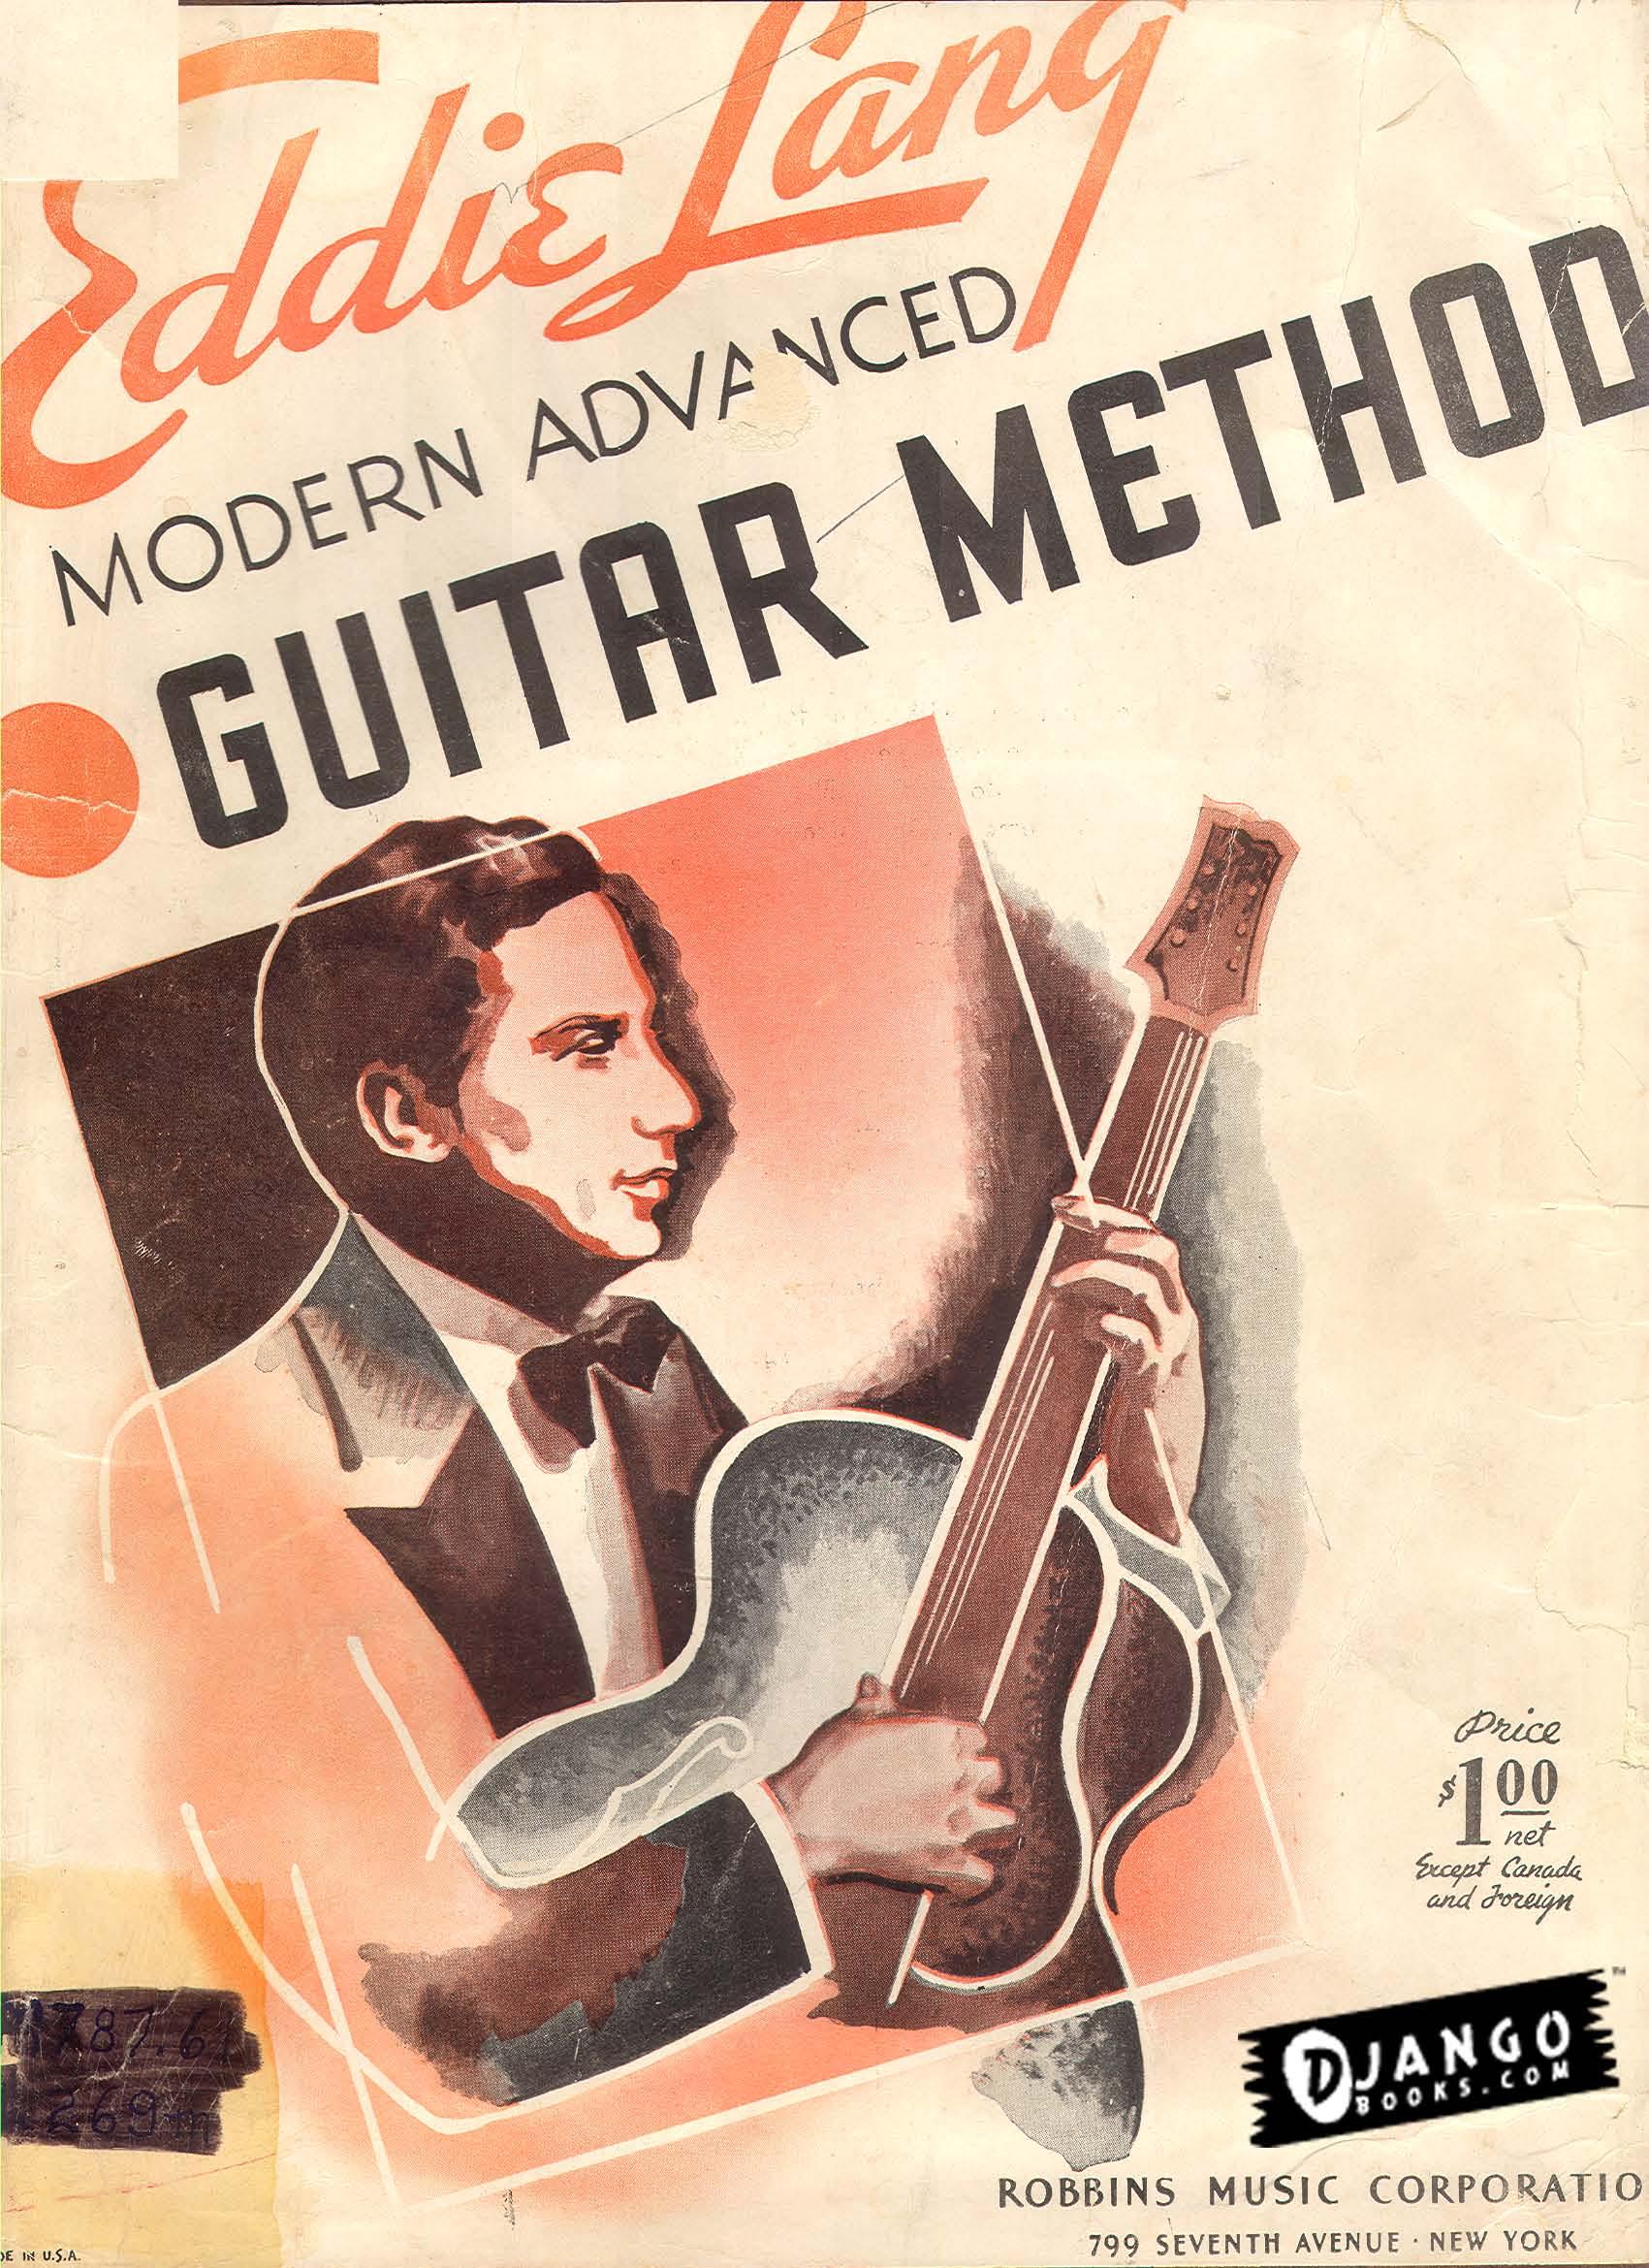 Modern Book Cover Guitar : New ebook eddie lang modern advanced guitar method